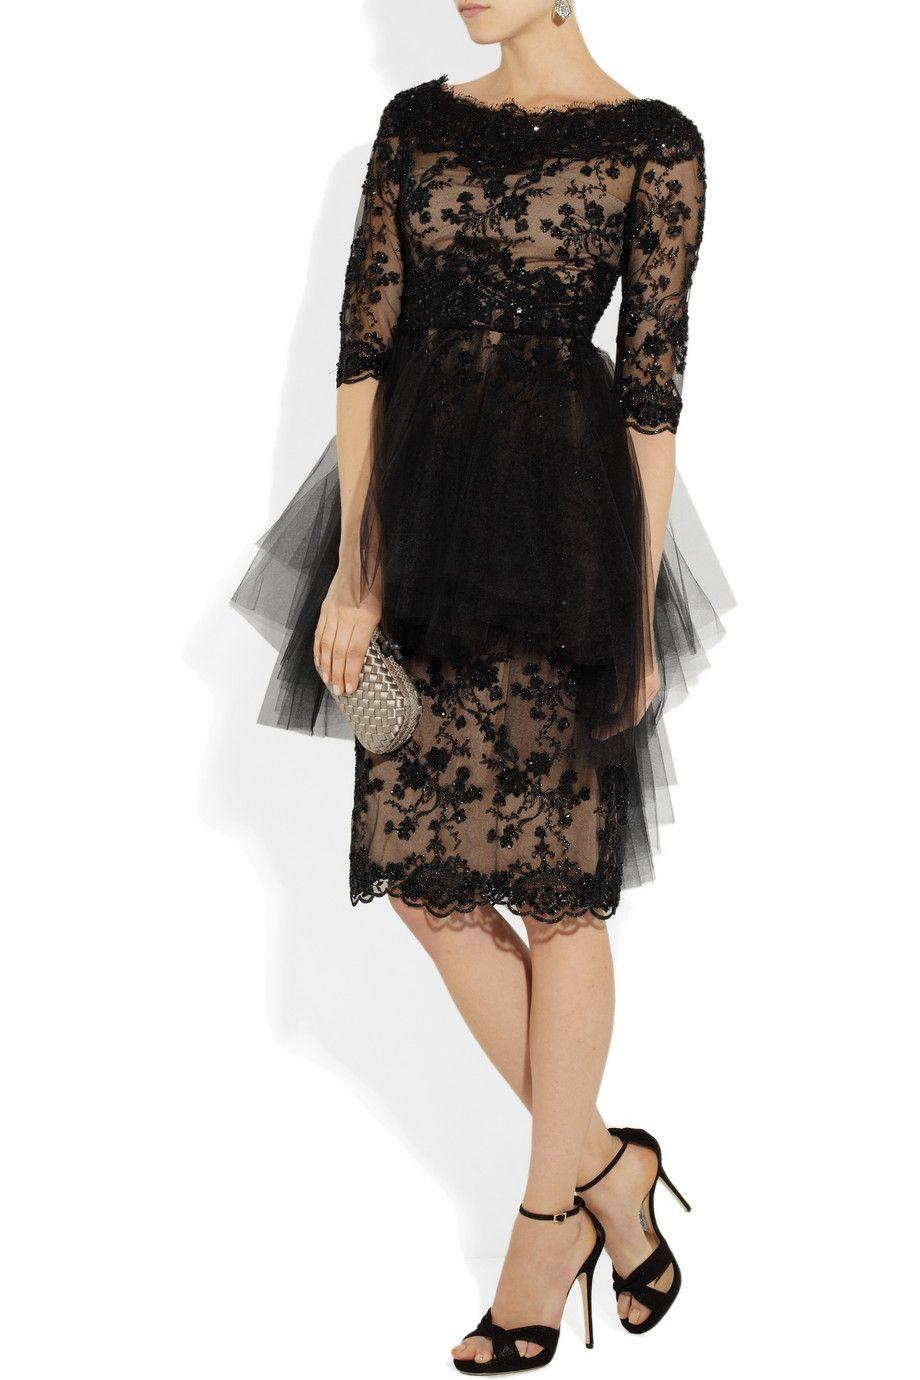 Marchesa|Embellished tulle dress  $3,995